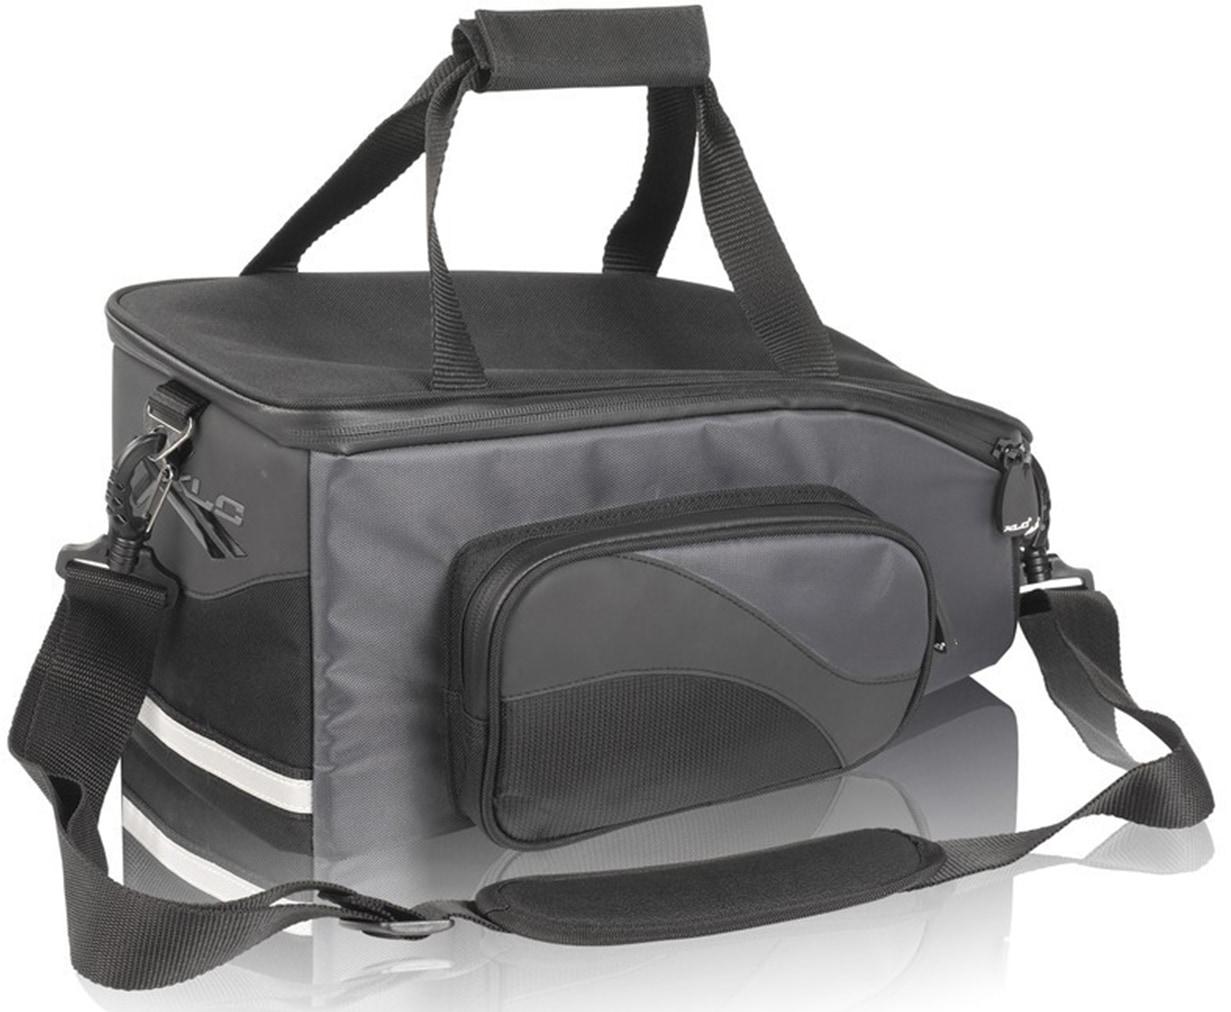 XLC Gepäckträgertasche System Gepäckträgertasche, schwarz